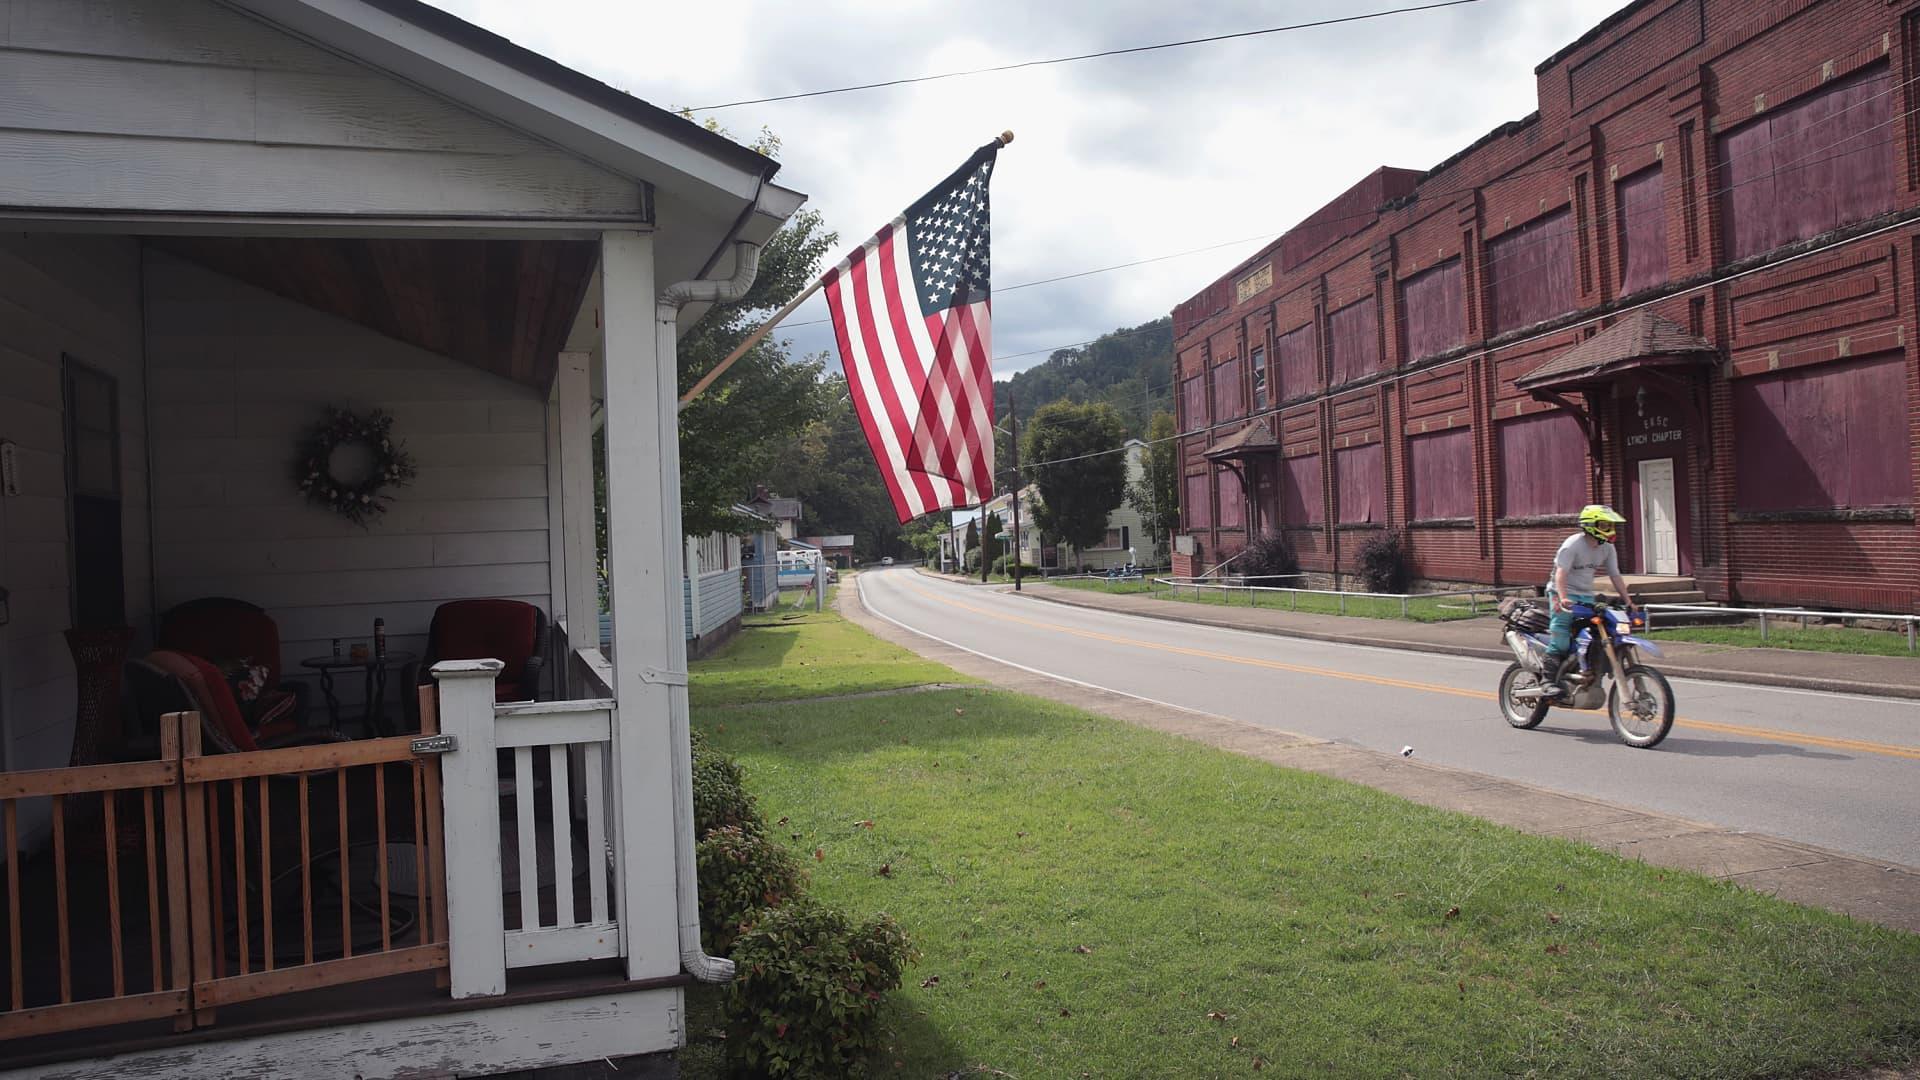 A home in Lynch, Kentucky.